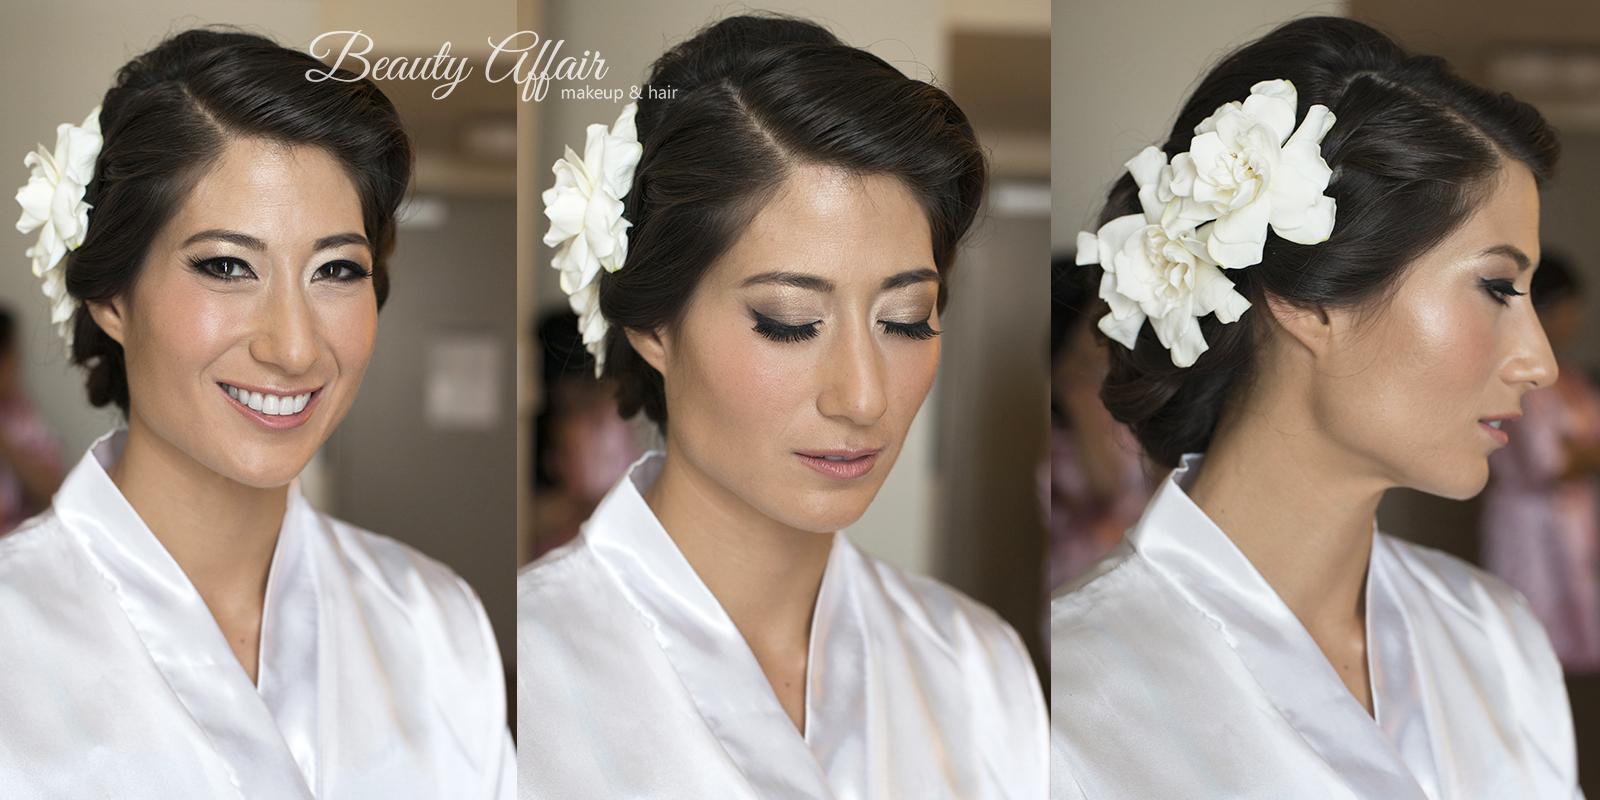 elegant glowing bridal makeup updo by Beauty Affair Agne Skaringa.jpg